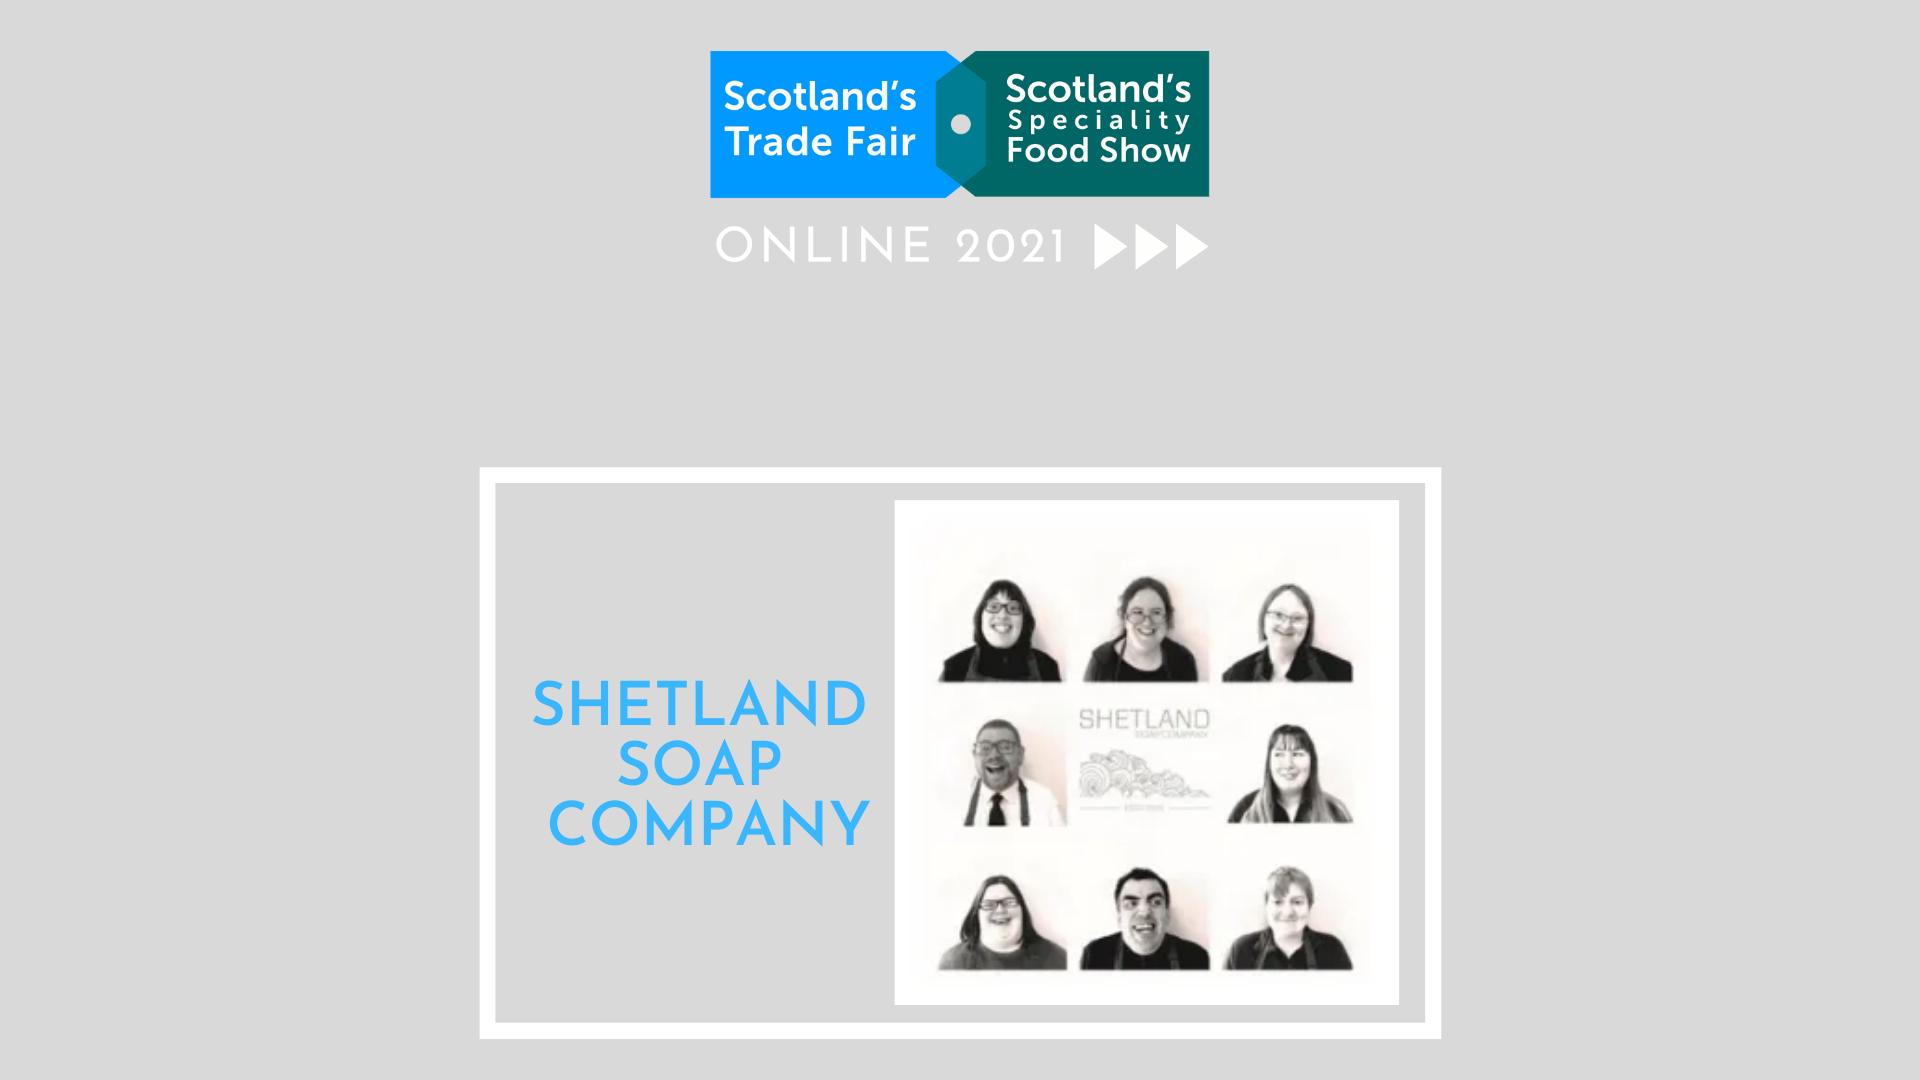 Shetland Soap Company - Live Presentation